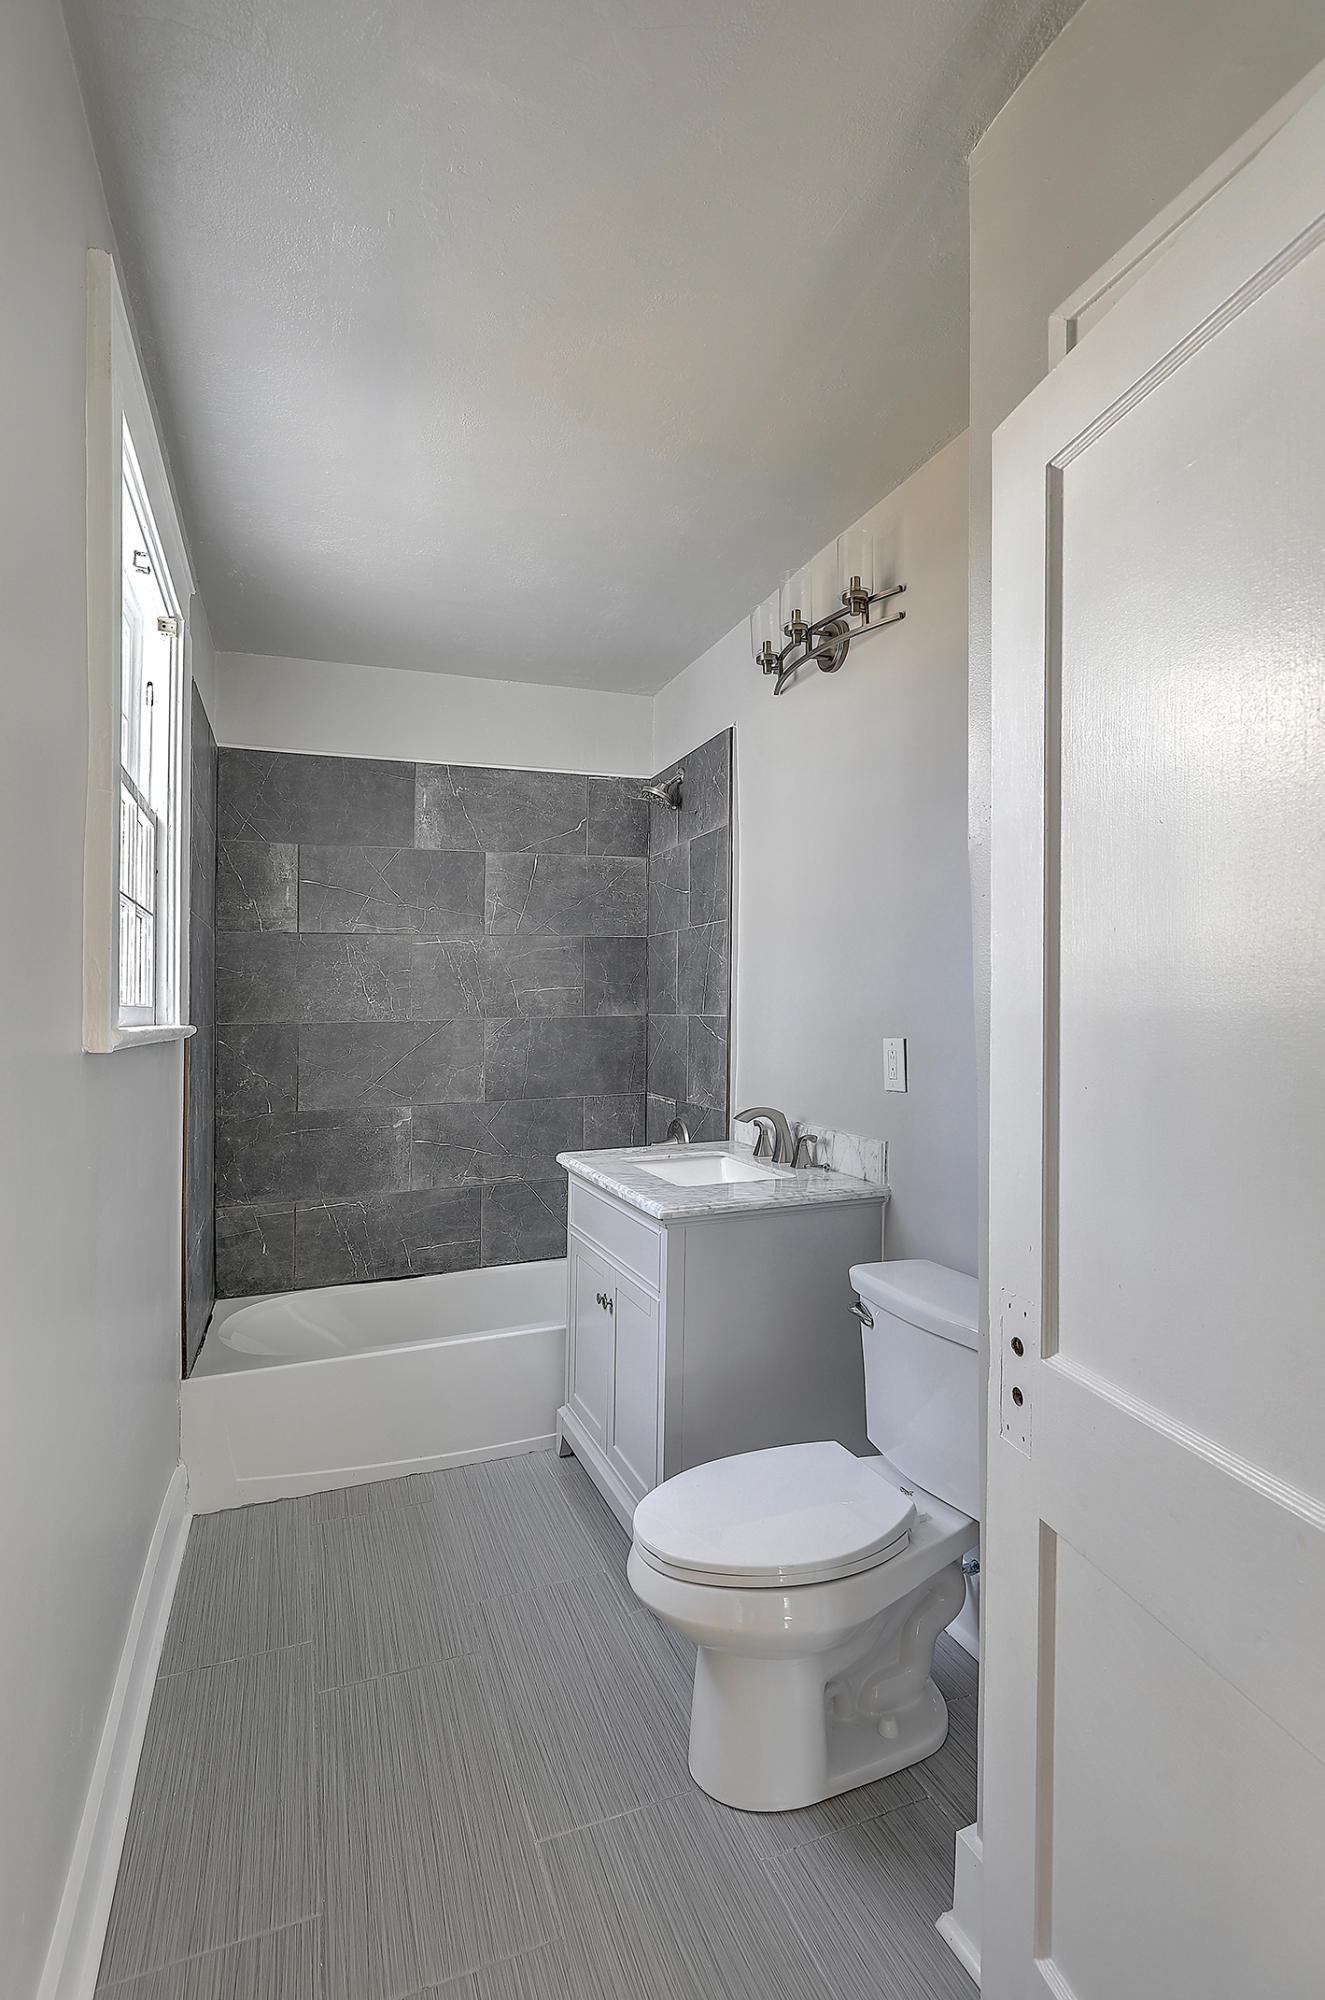 Riverland Terrace Homes For Sale - 2166 St James, Charleston, SC - 18